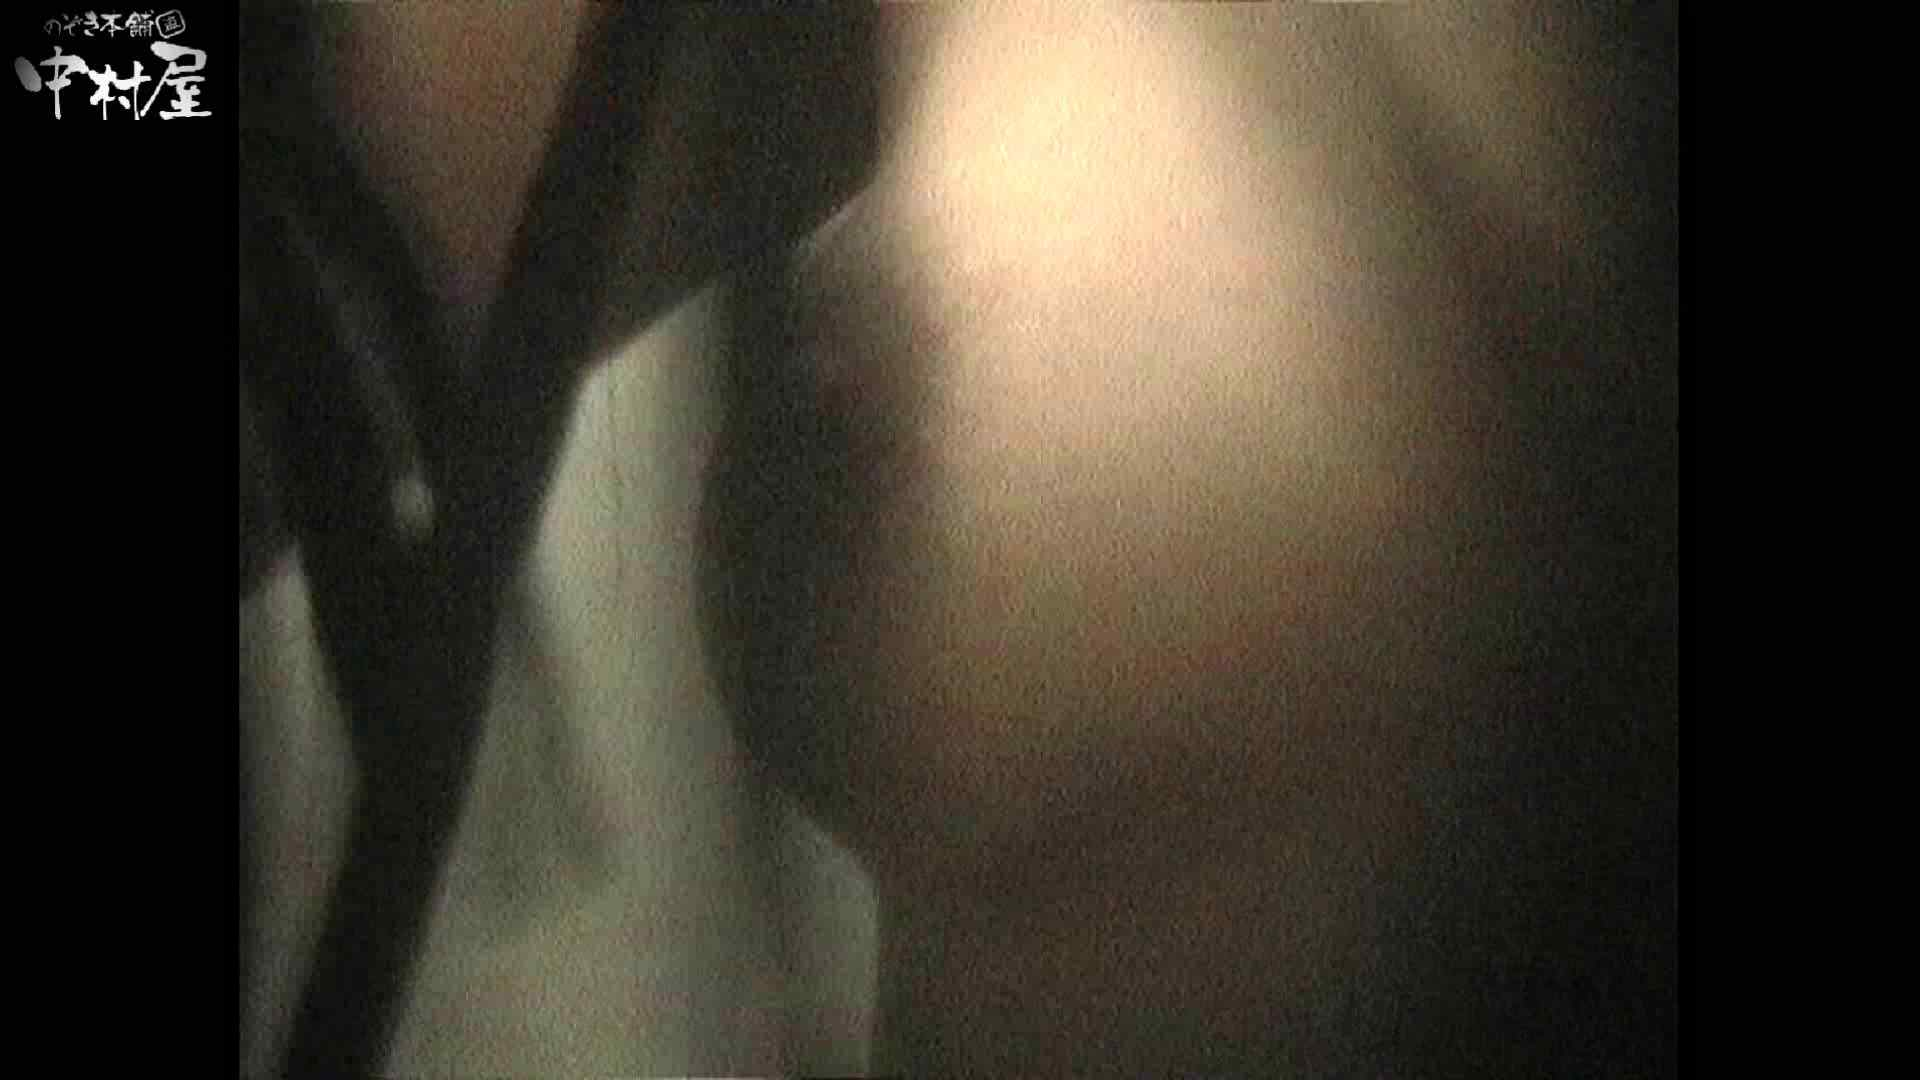 No.16 アニマル柄の水着 レースのパンツにナプキンを装着する金髪お姉さん 接写特集 盗撮動画紹介 63連発 2